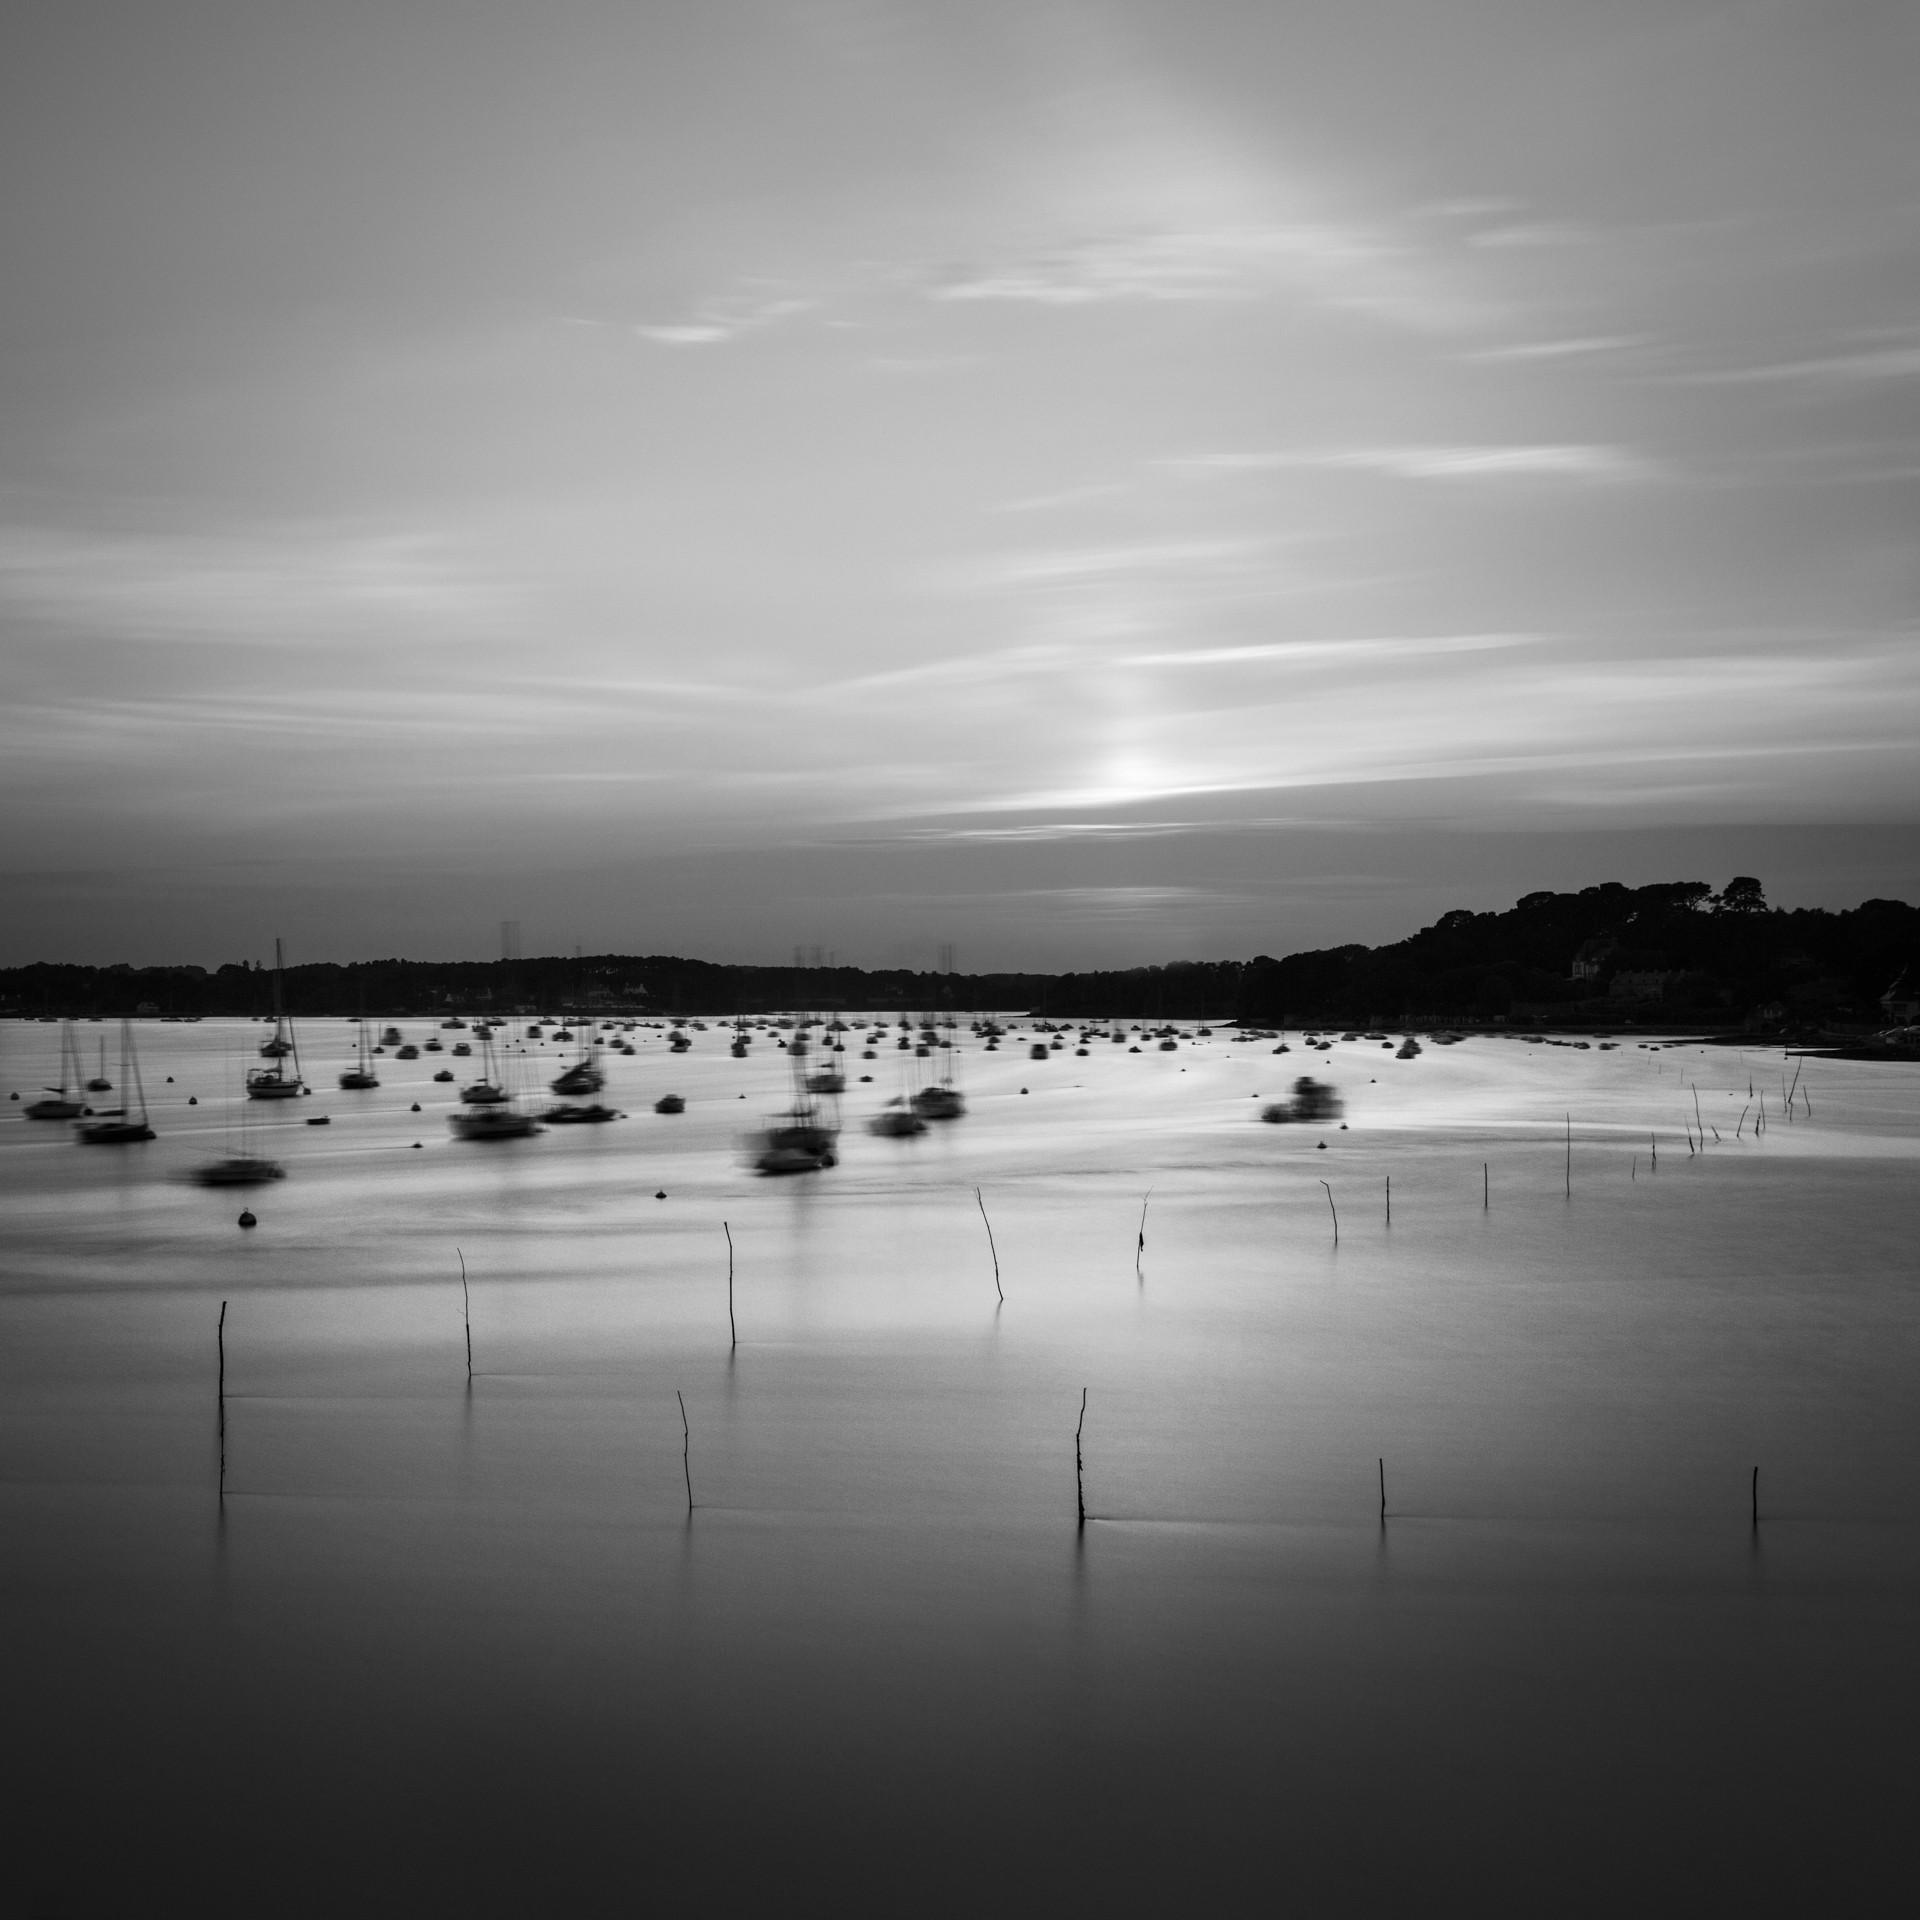 Pointe d'Arradon - Morbihan - Août 2020